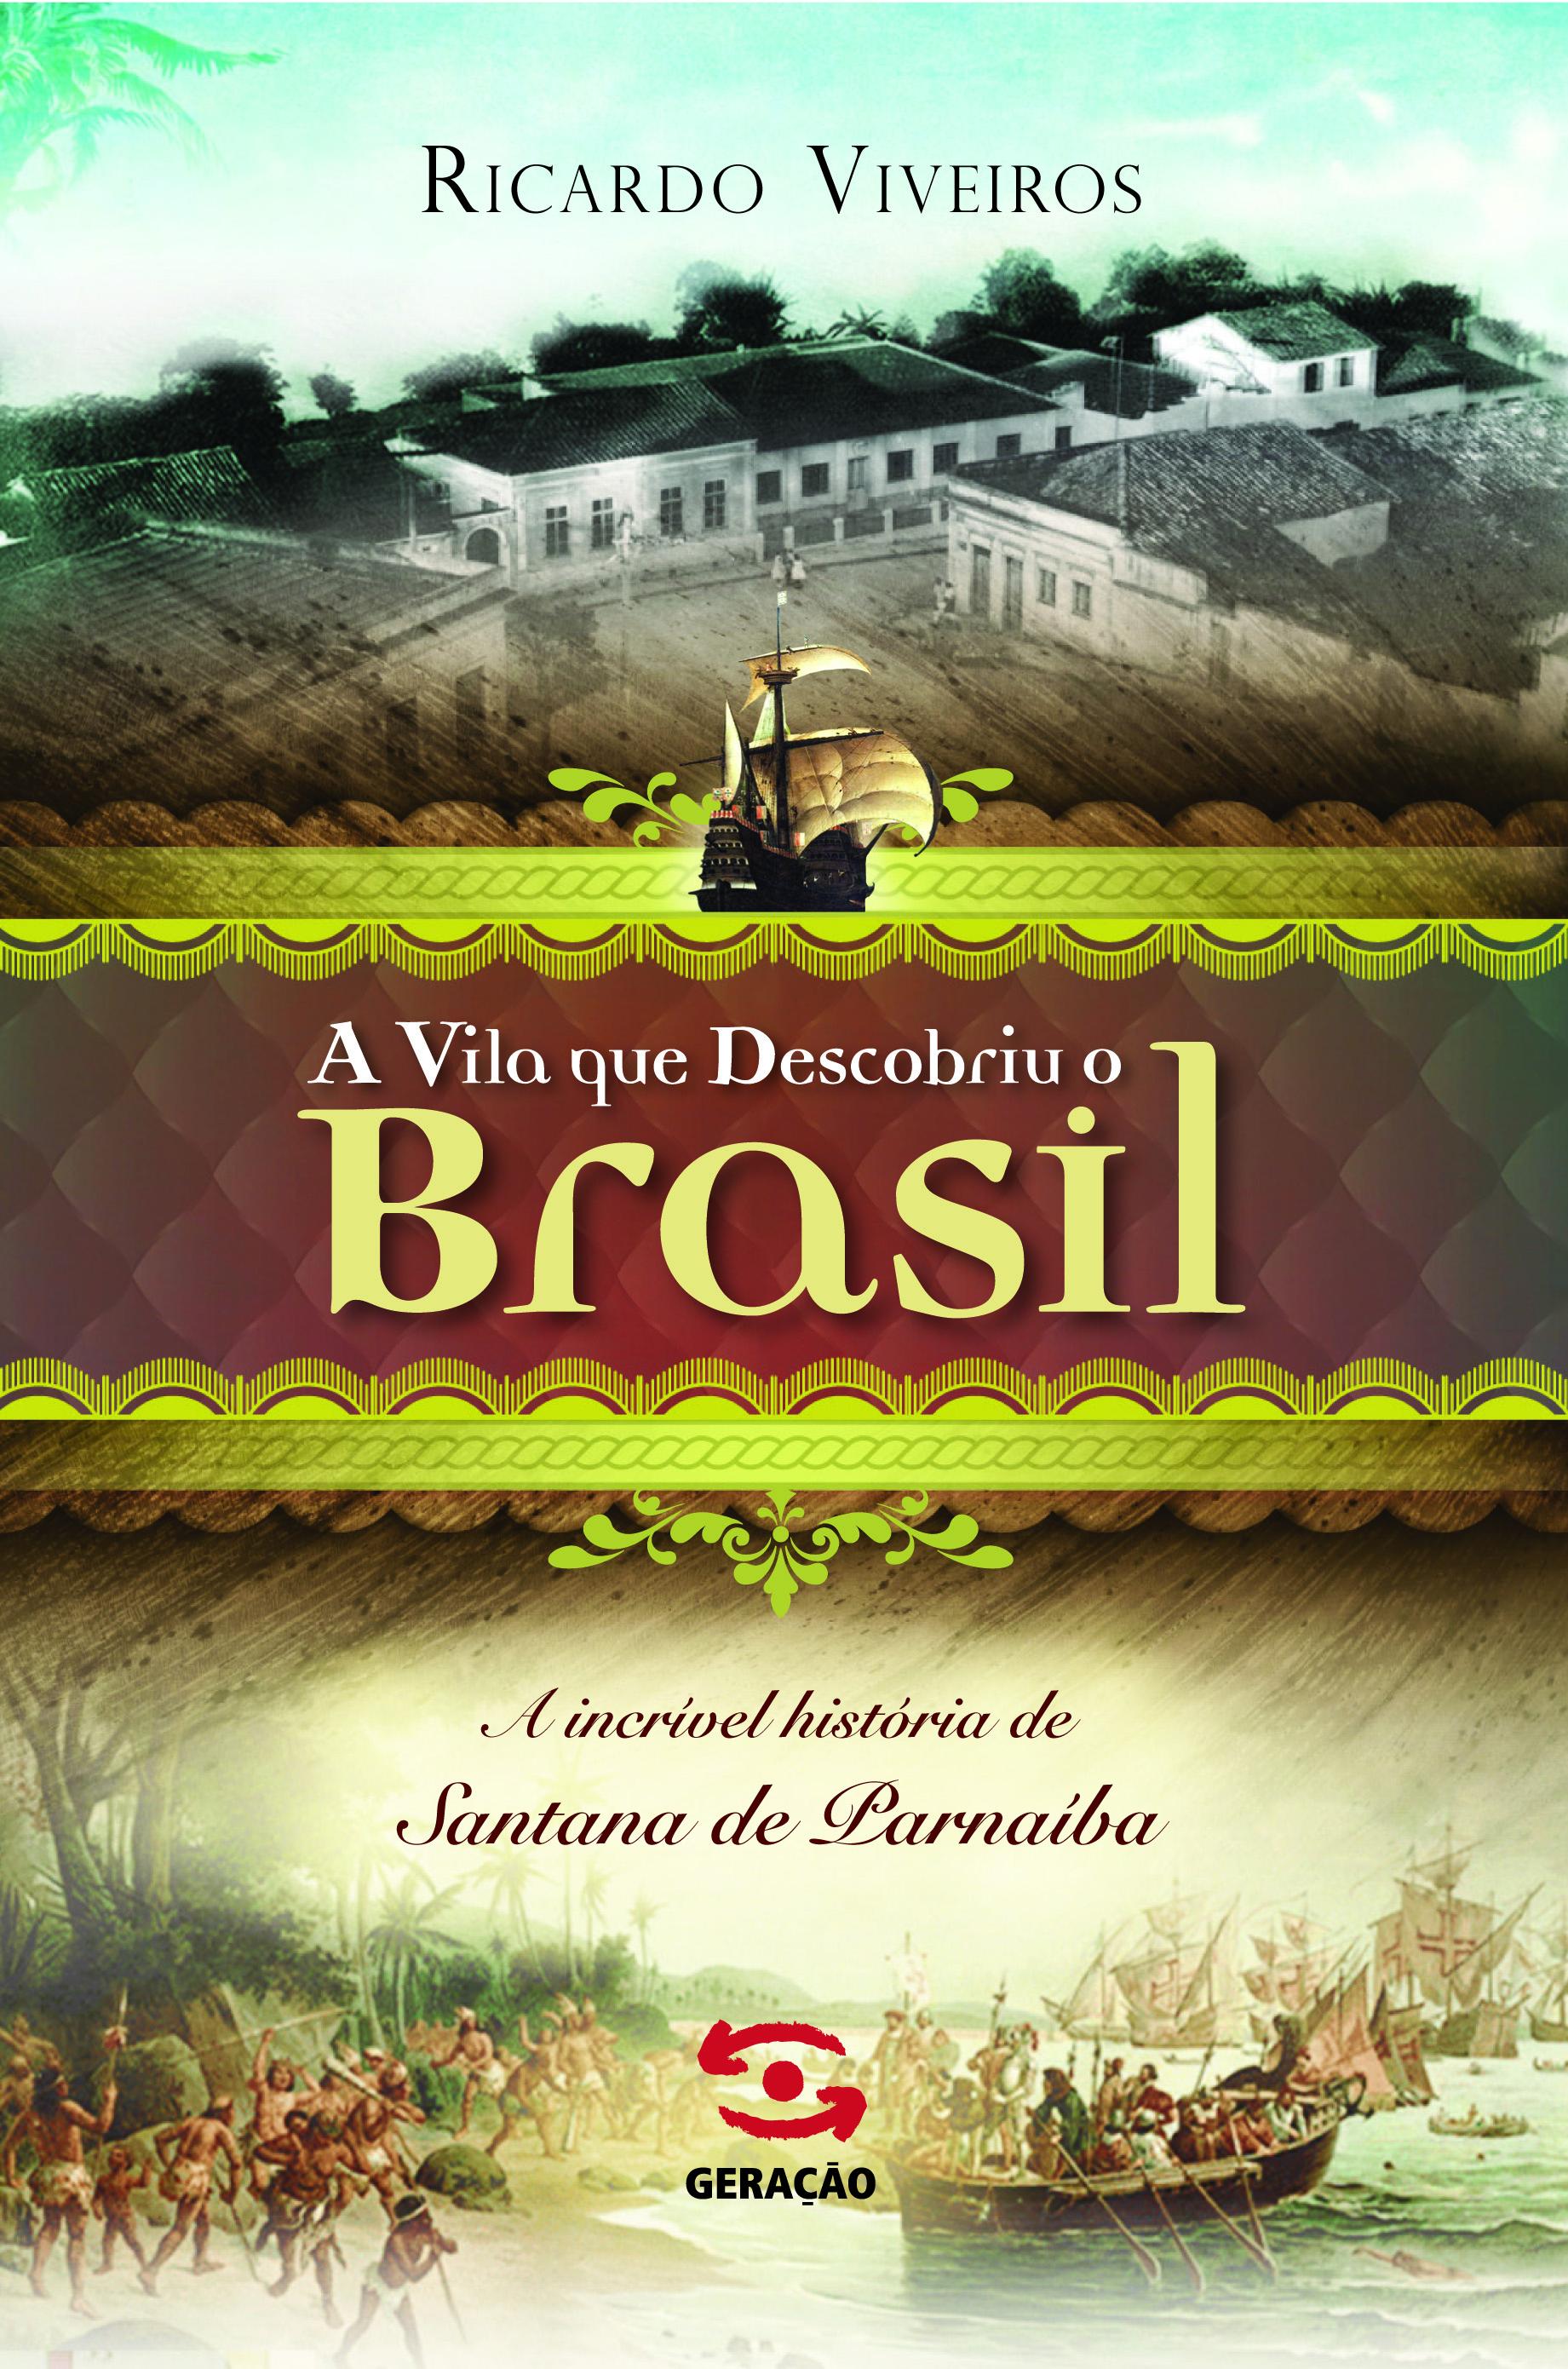 Vila Que Descobriu o Brasil, A: A Incrível História de Santana de Parnaíba, livro de Ricardo Viveiros